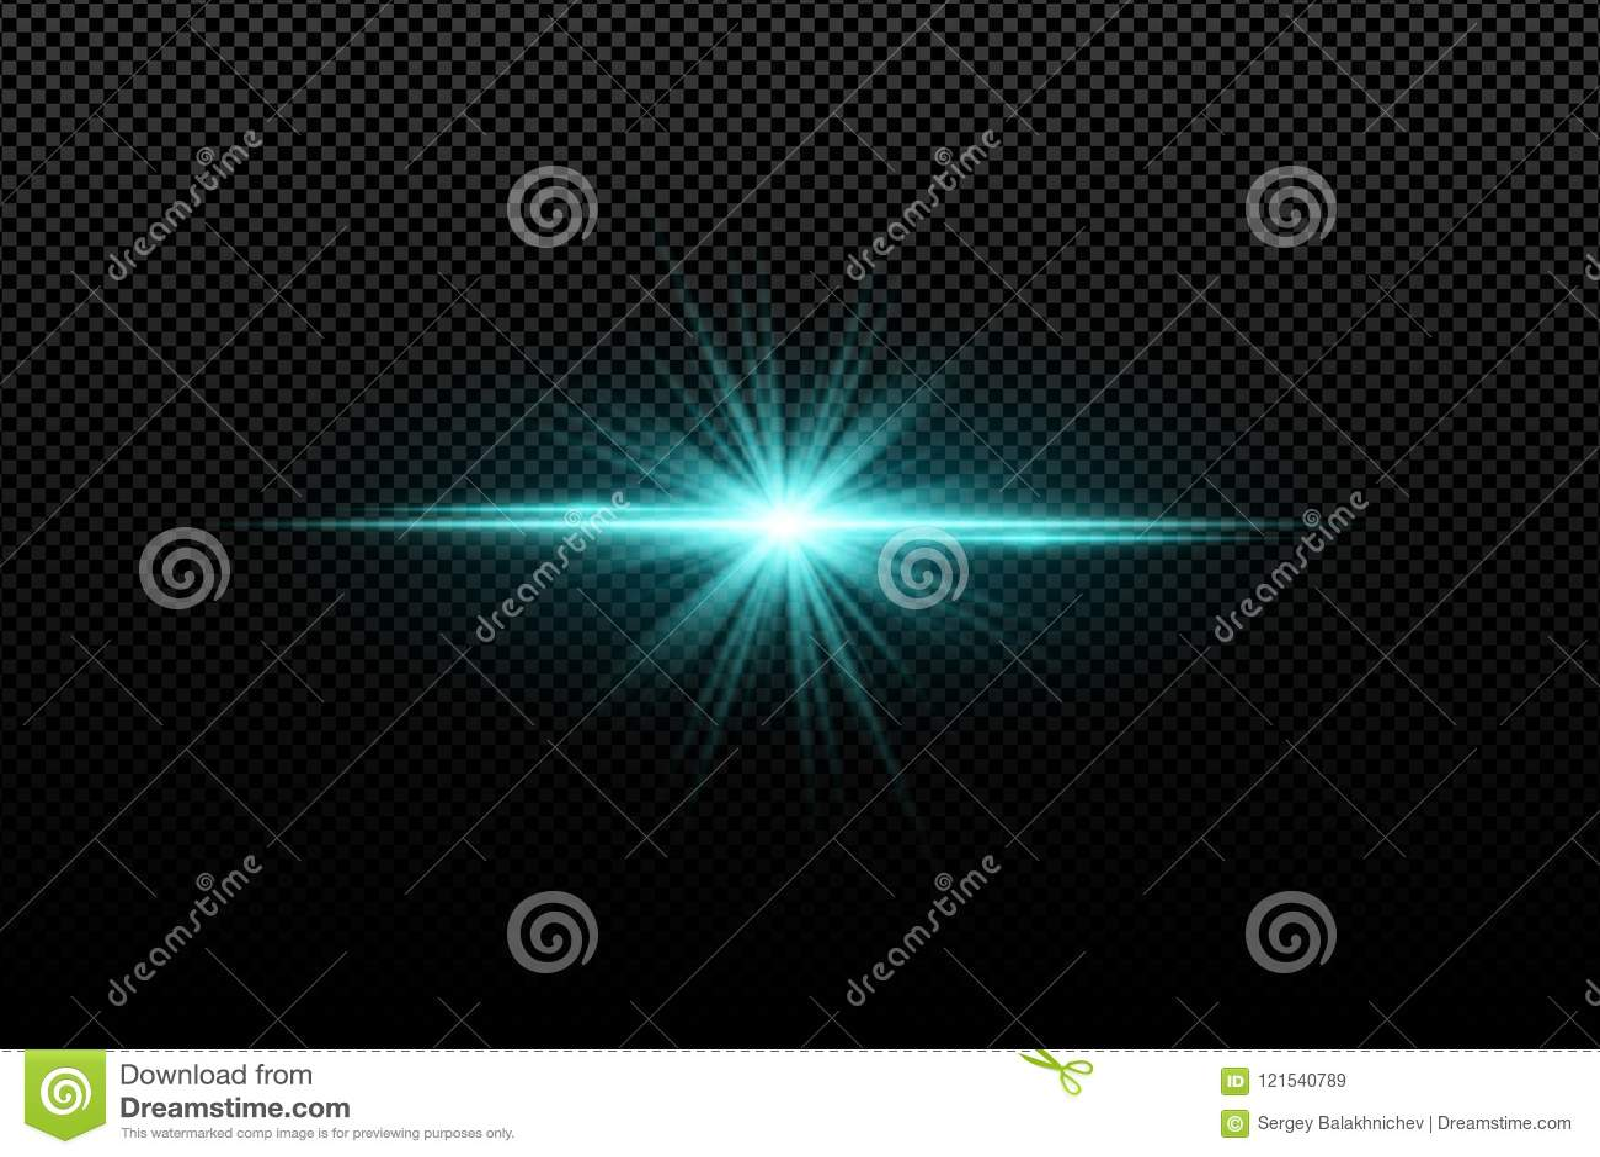 Abstract helder modieus lichteffect voor een transparante achtergrond Heldere gloeiende ster Multicolored gloed Blauwe stralen Kl